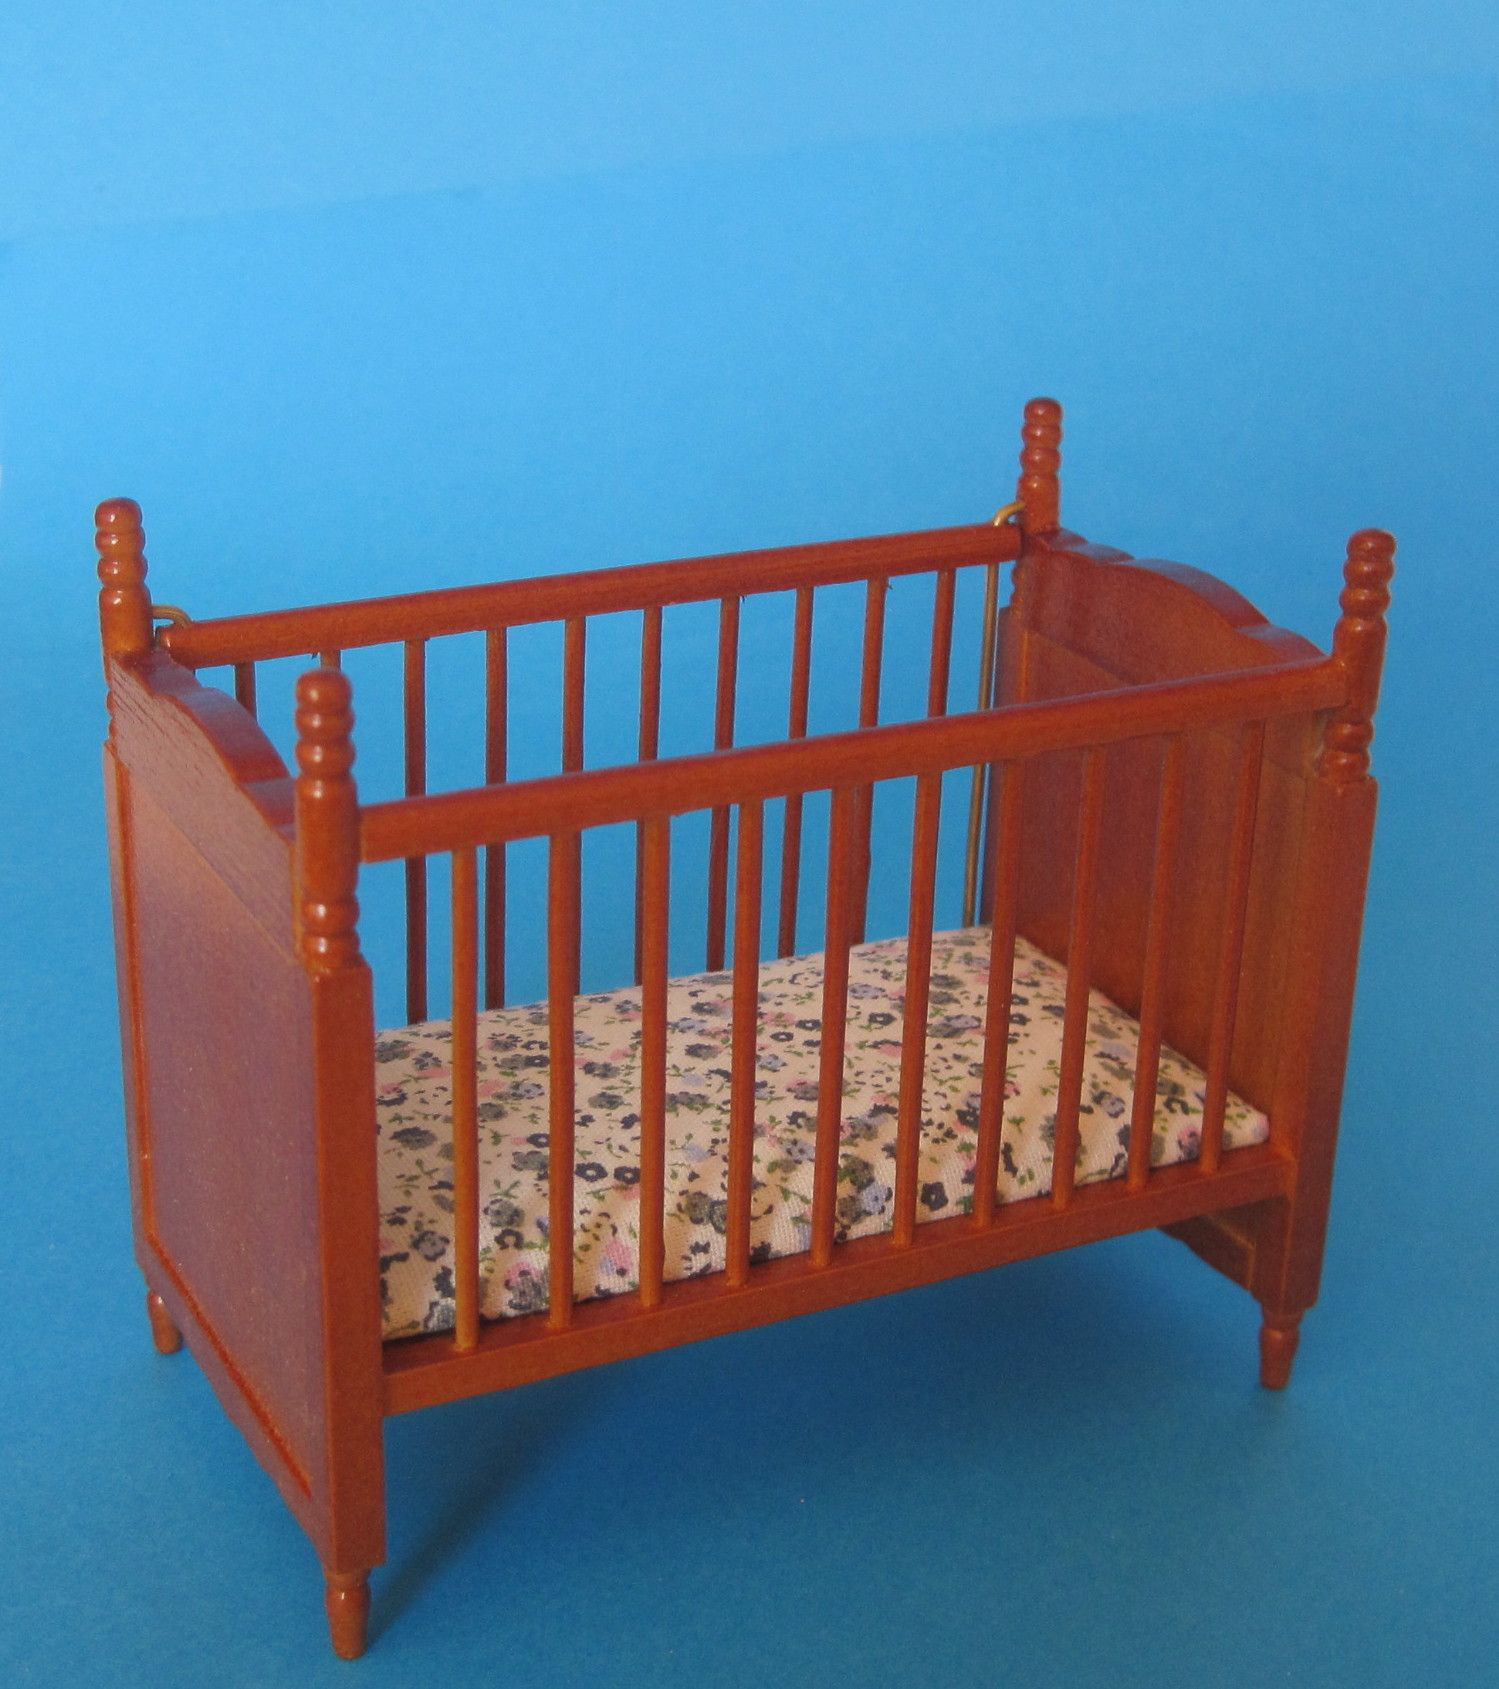 puppenbett braun matratze puppenhaus kinderzimmer miniatur 1 12 puppenhaus m bel pinterest. Black Bedroom Furniture Sets. Home Design Ideas